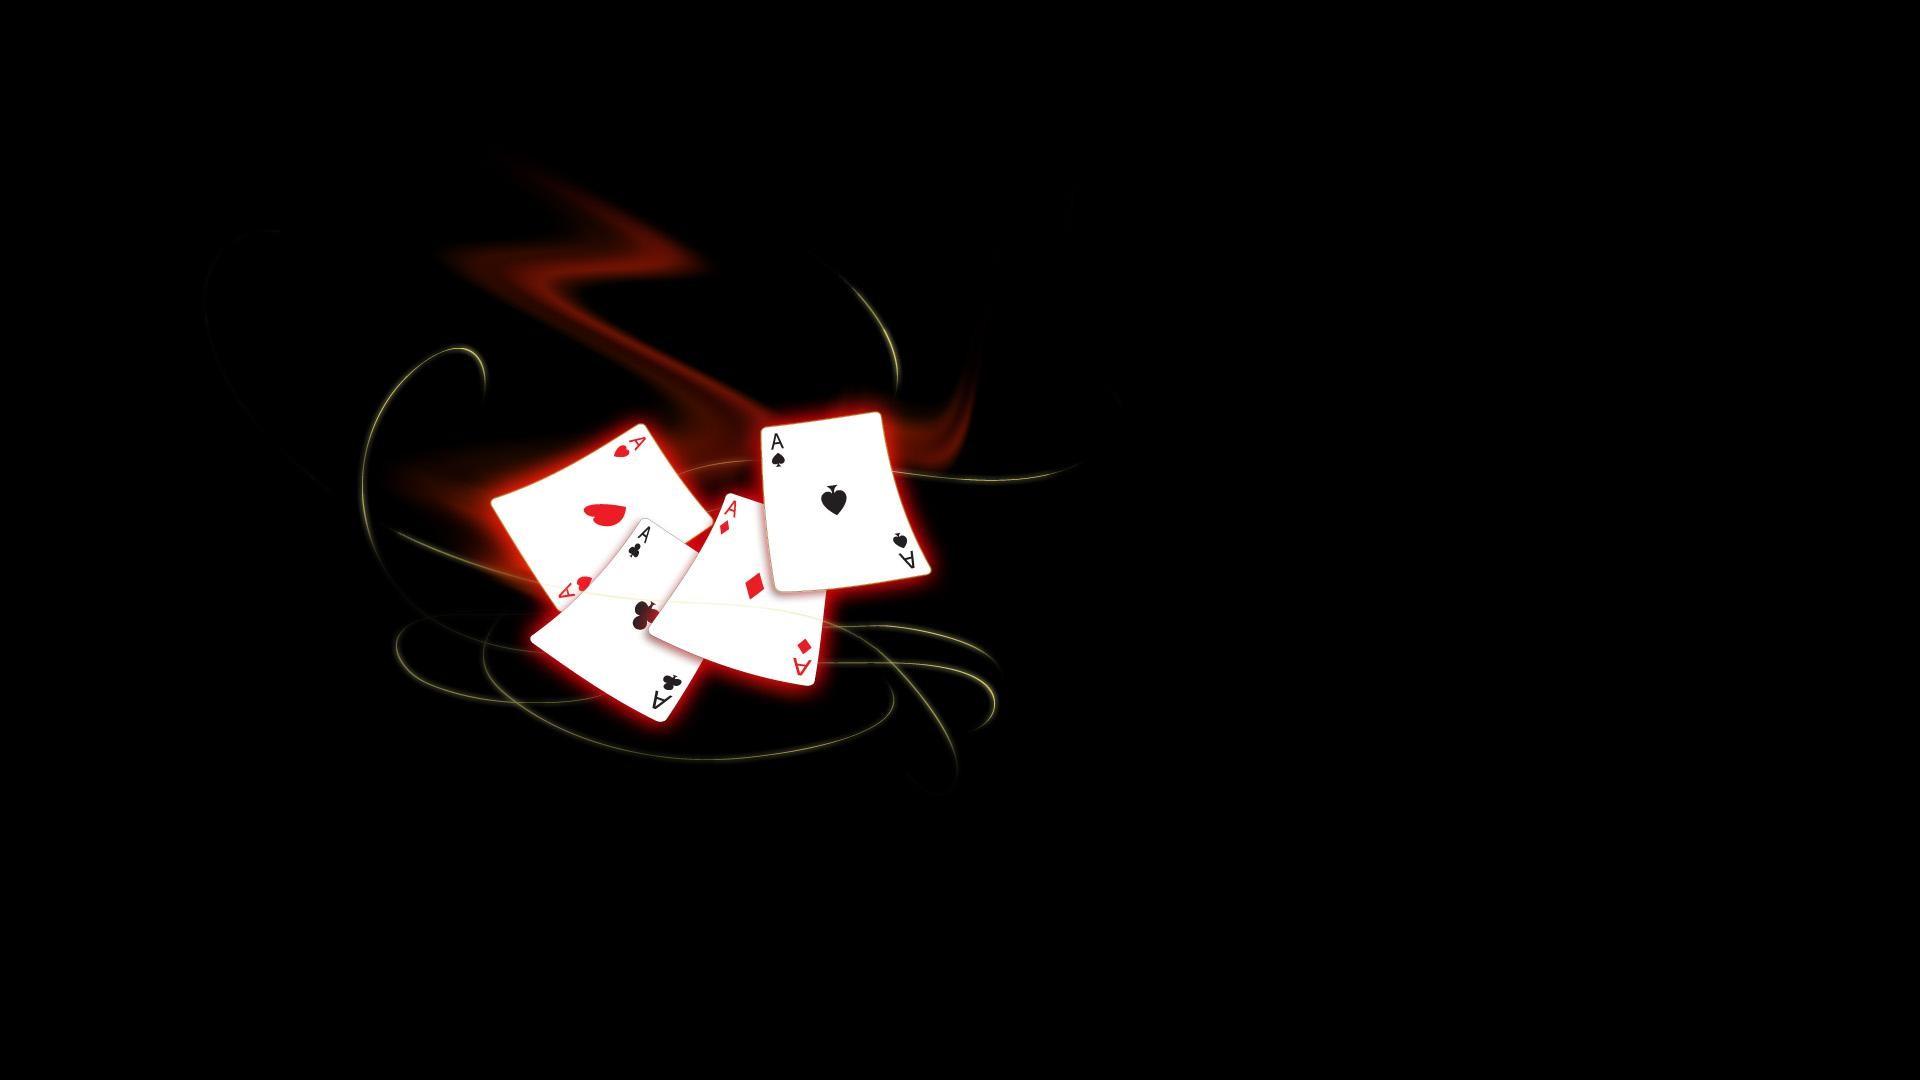 Res: 1920x1080, Poker Wallpaper Hd 1458247